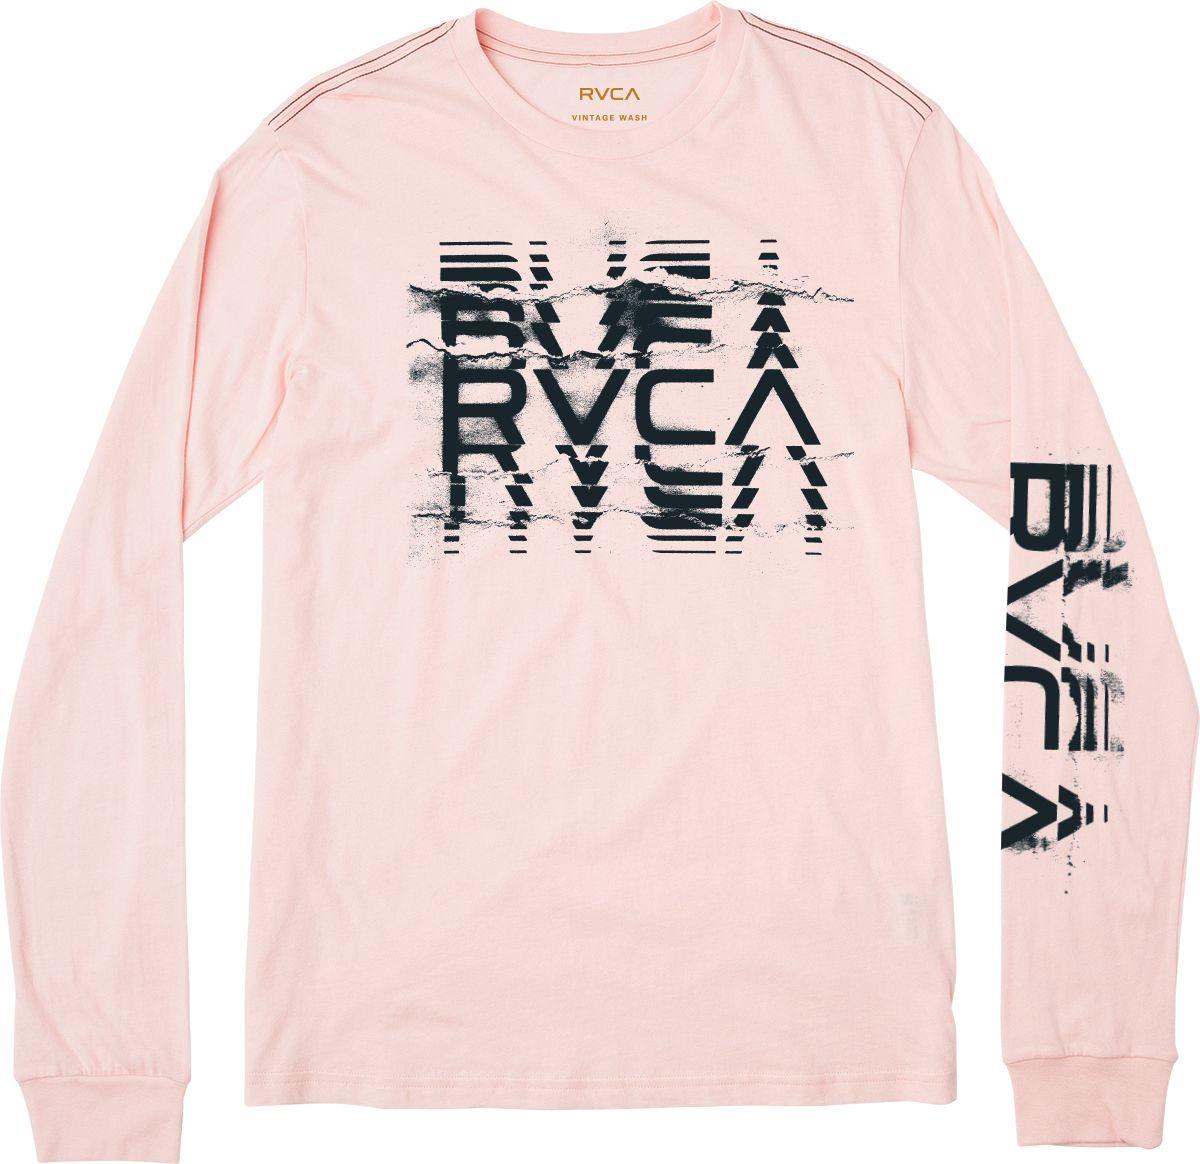 Big Torn Long Sleeve T Shirt Big And Shirt Designs